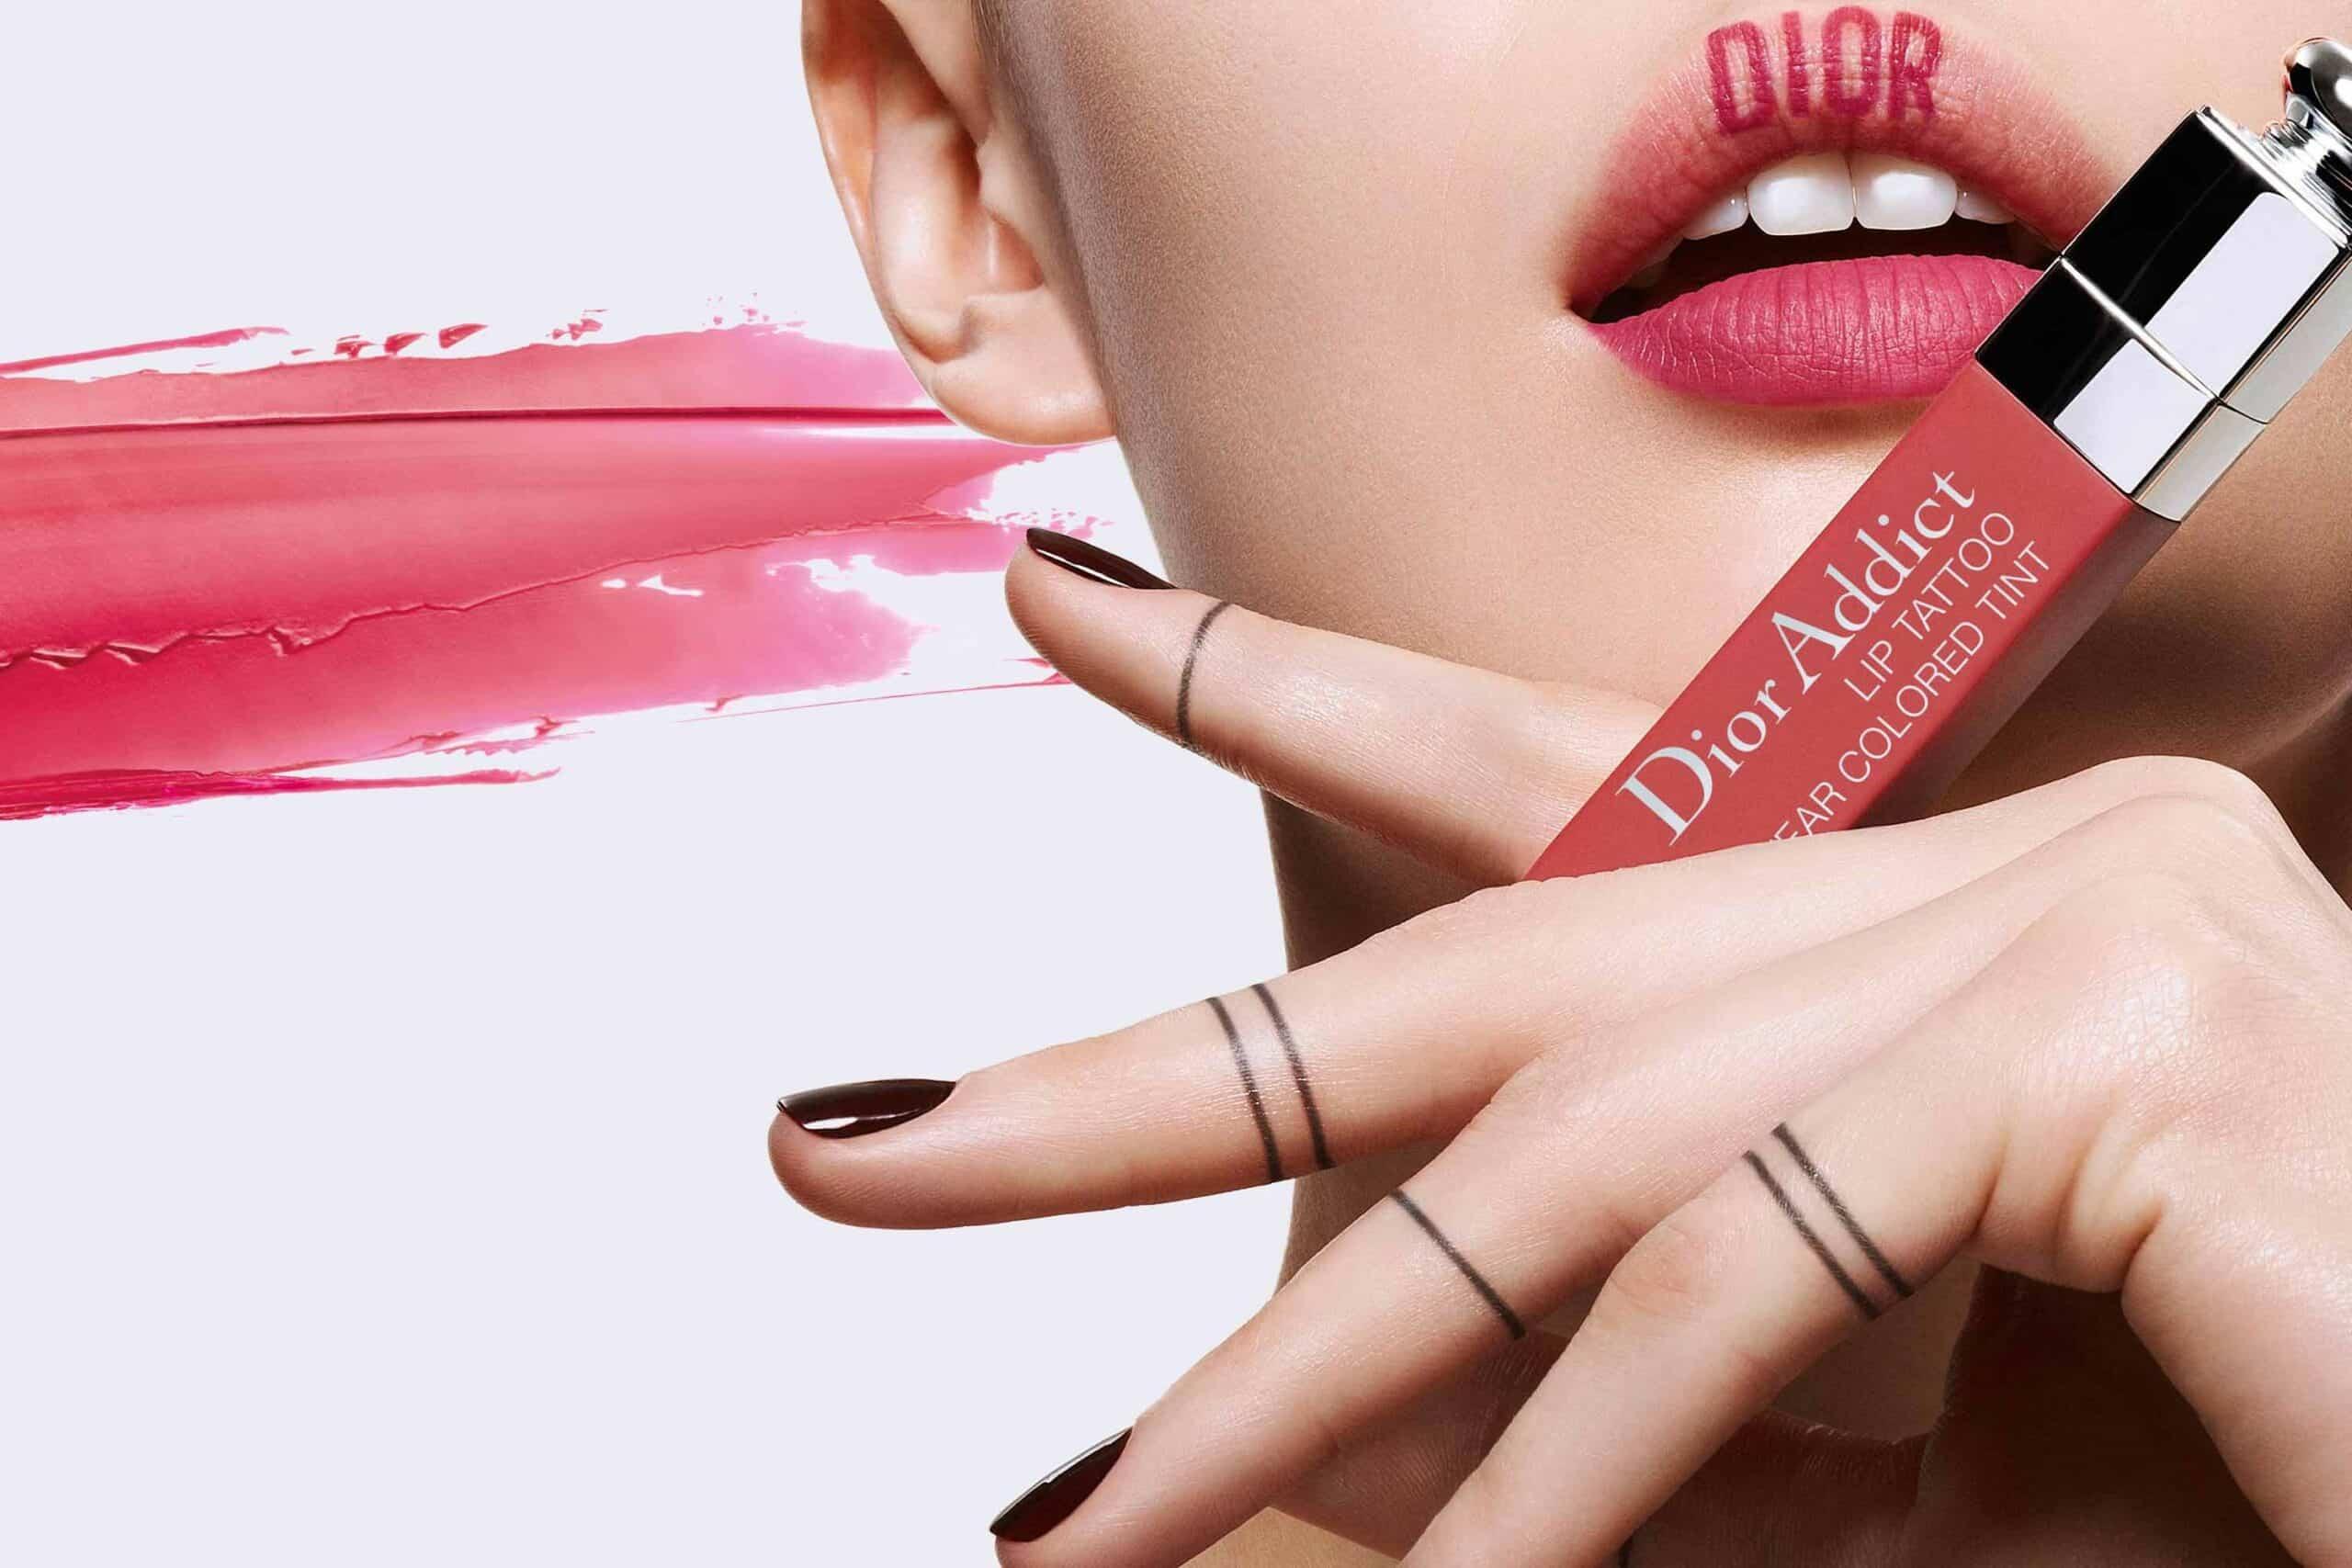 Dior-Addict-Lip-Tattoo-scaled